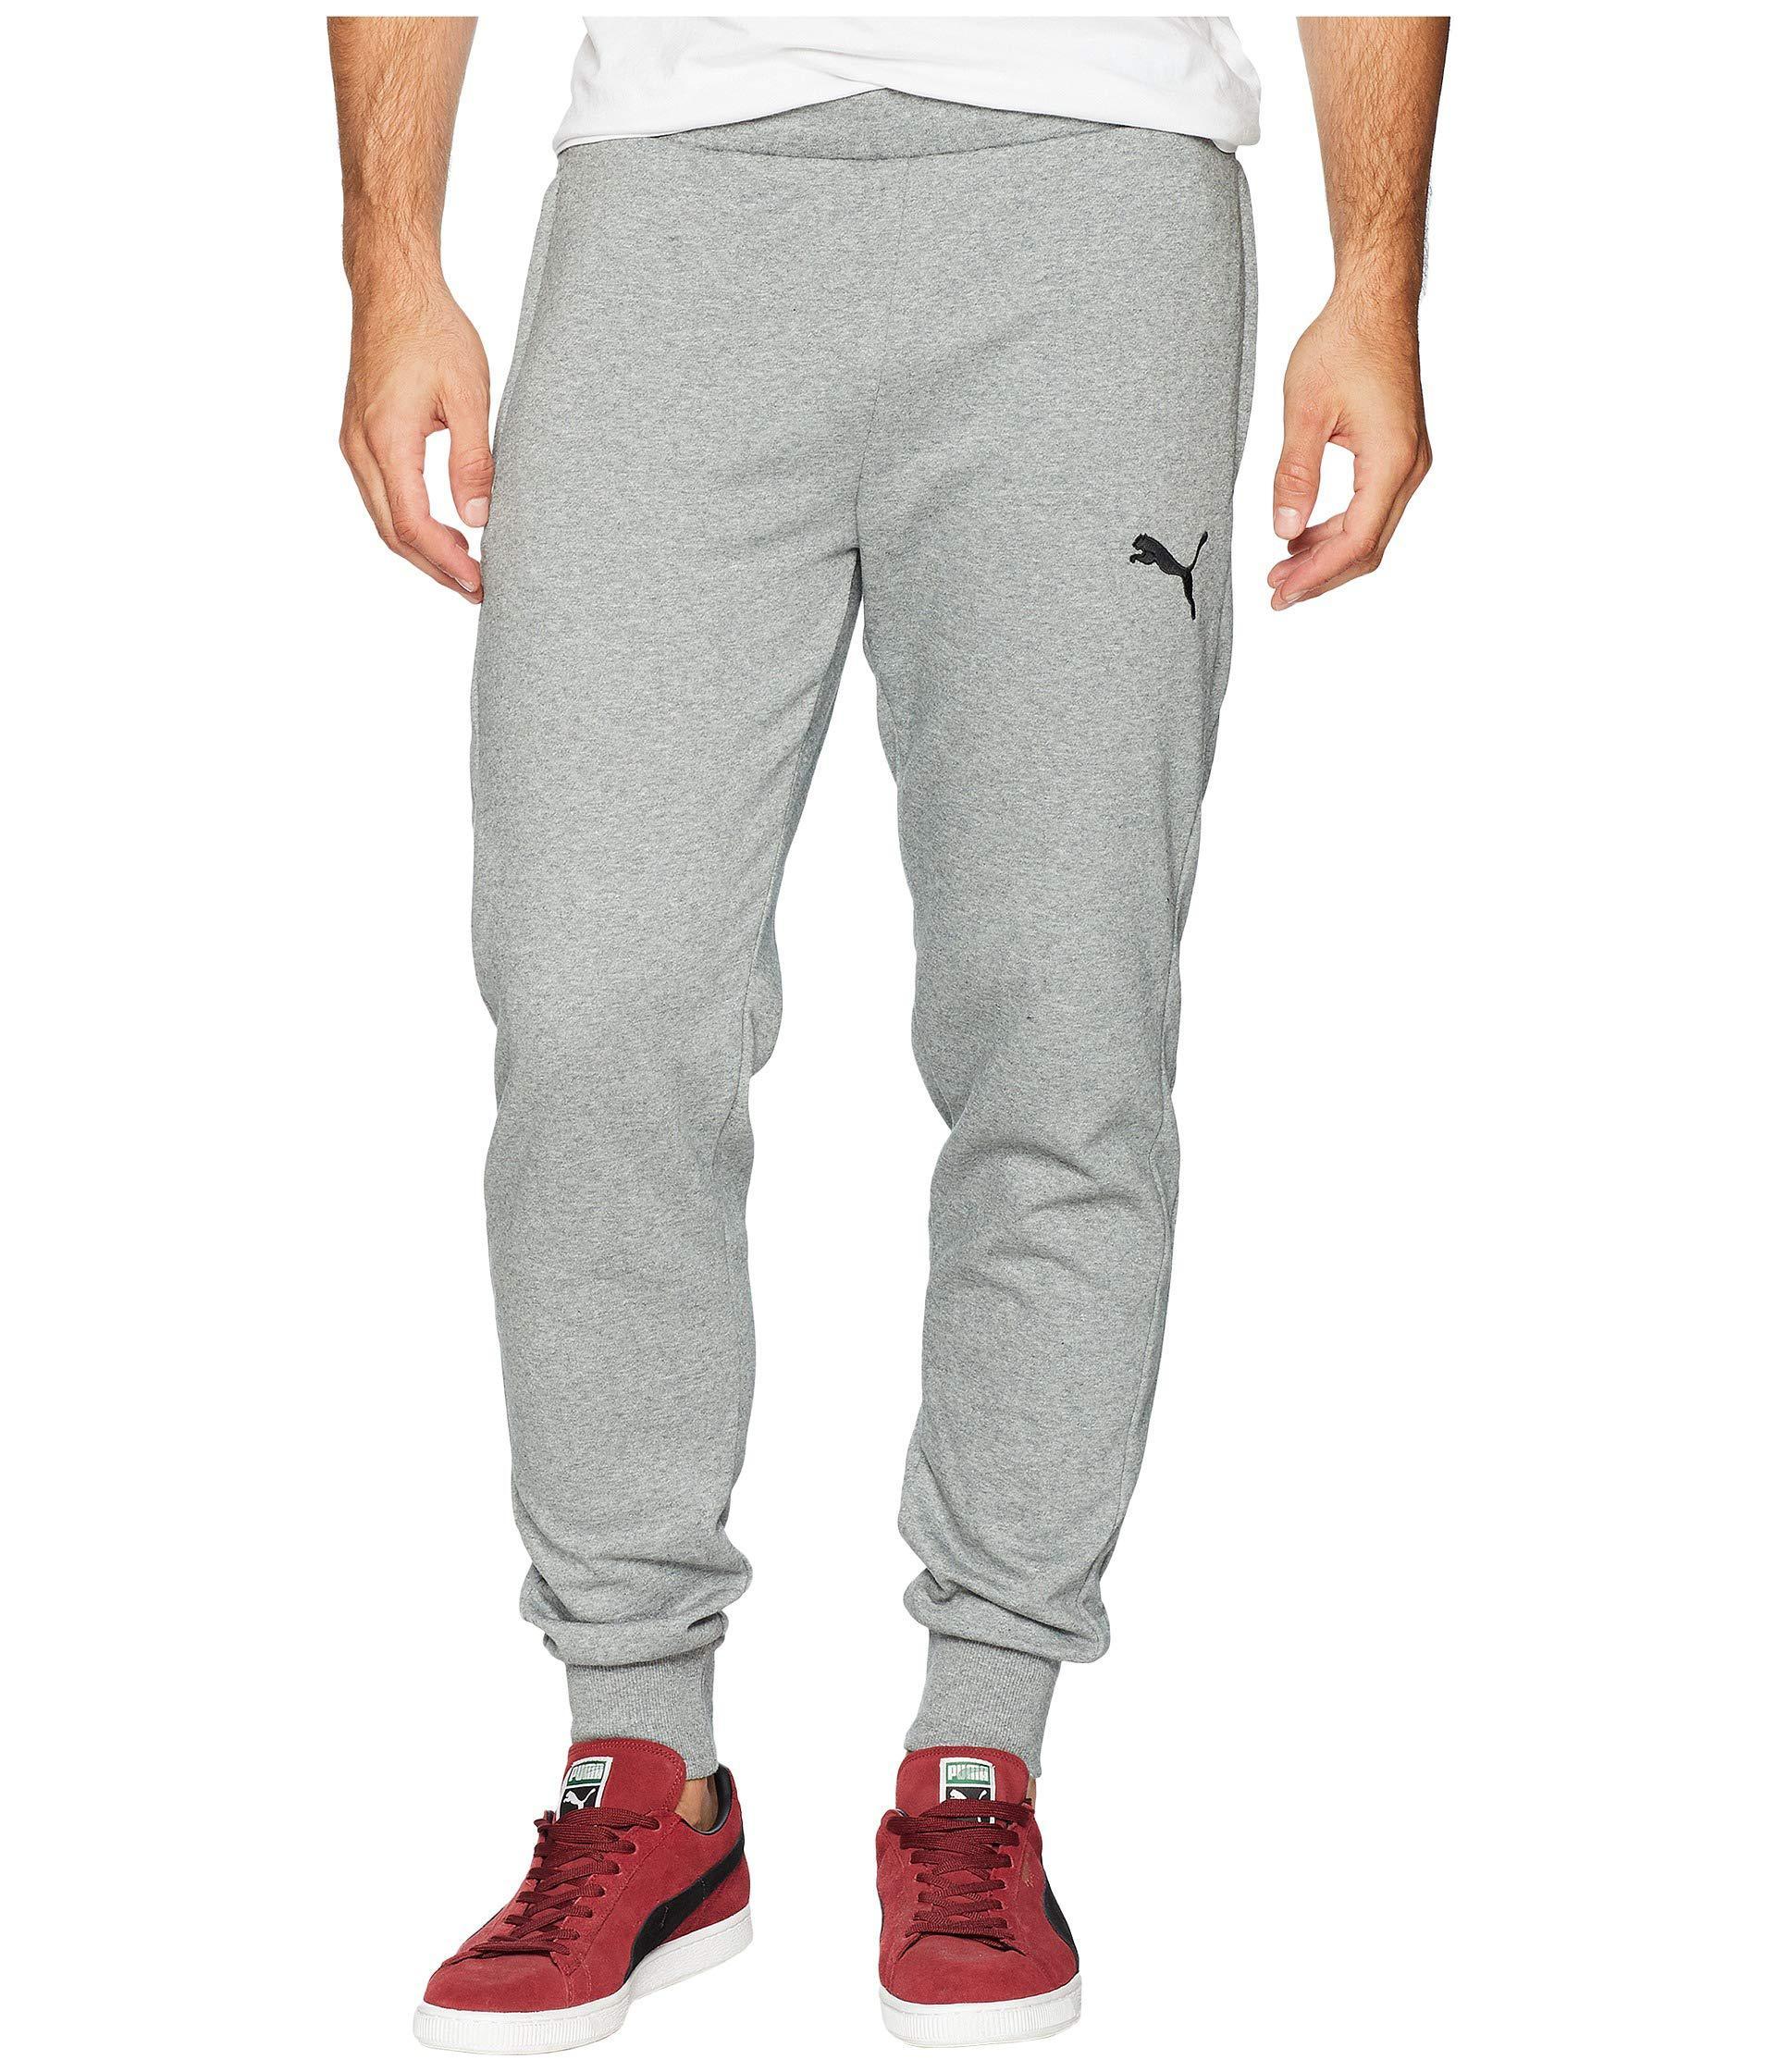 Lyst - PUMA P48 Modern Sports Fleece Open Cuffed Pants (cotton Black ... 7afe457f3269